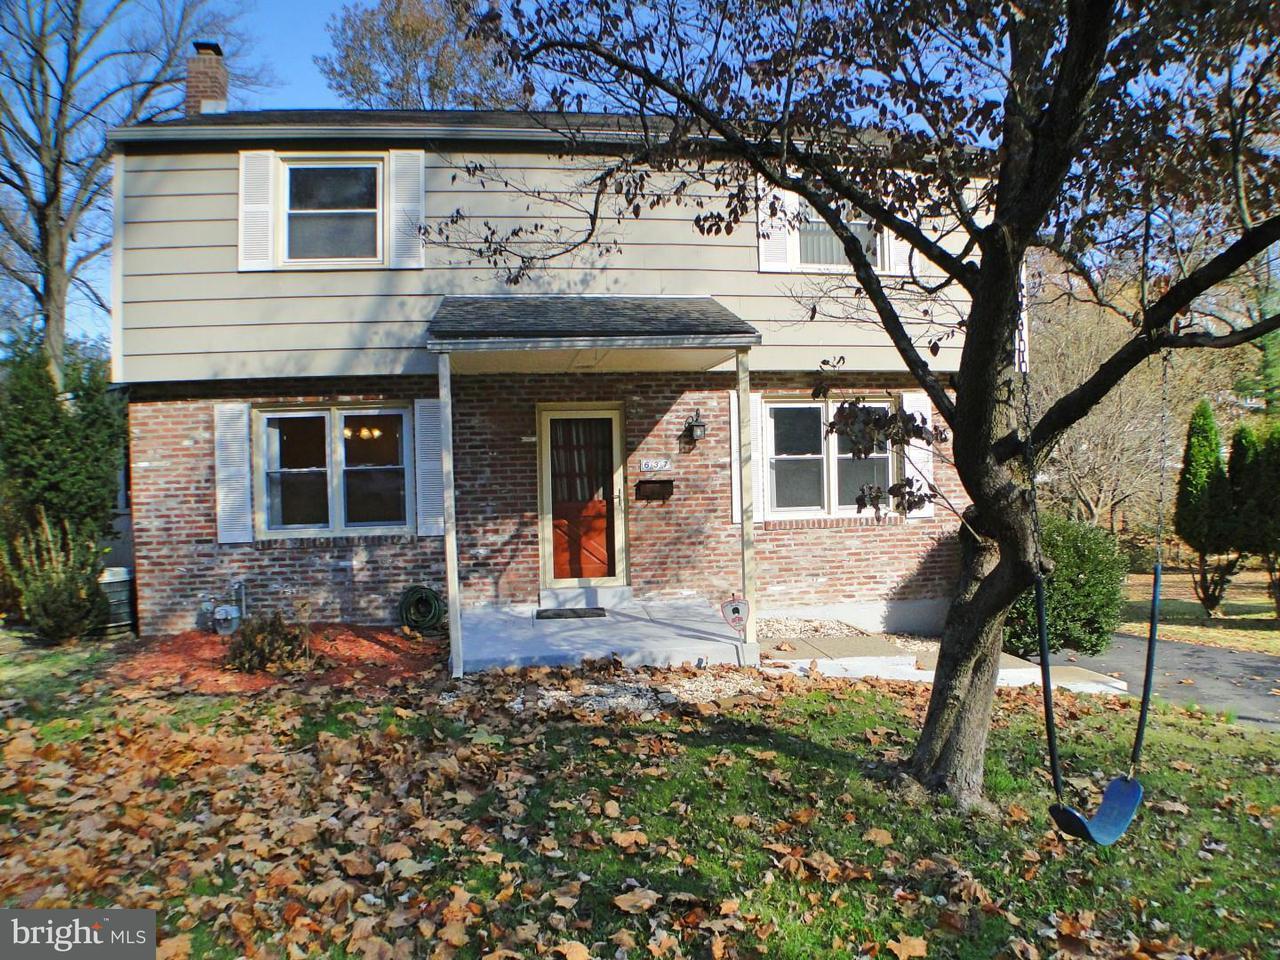 独户住宅 为 出租 在 637 N BISHOP Avenue Springfield, 宾夕法尼亚州 19064 美国